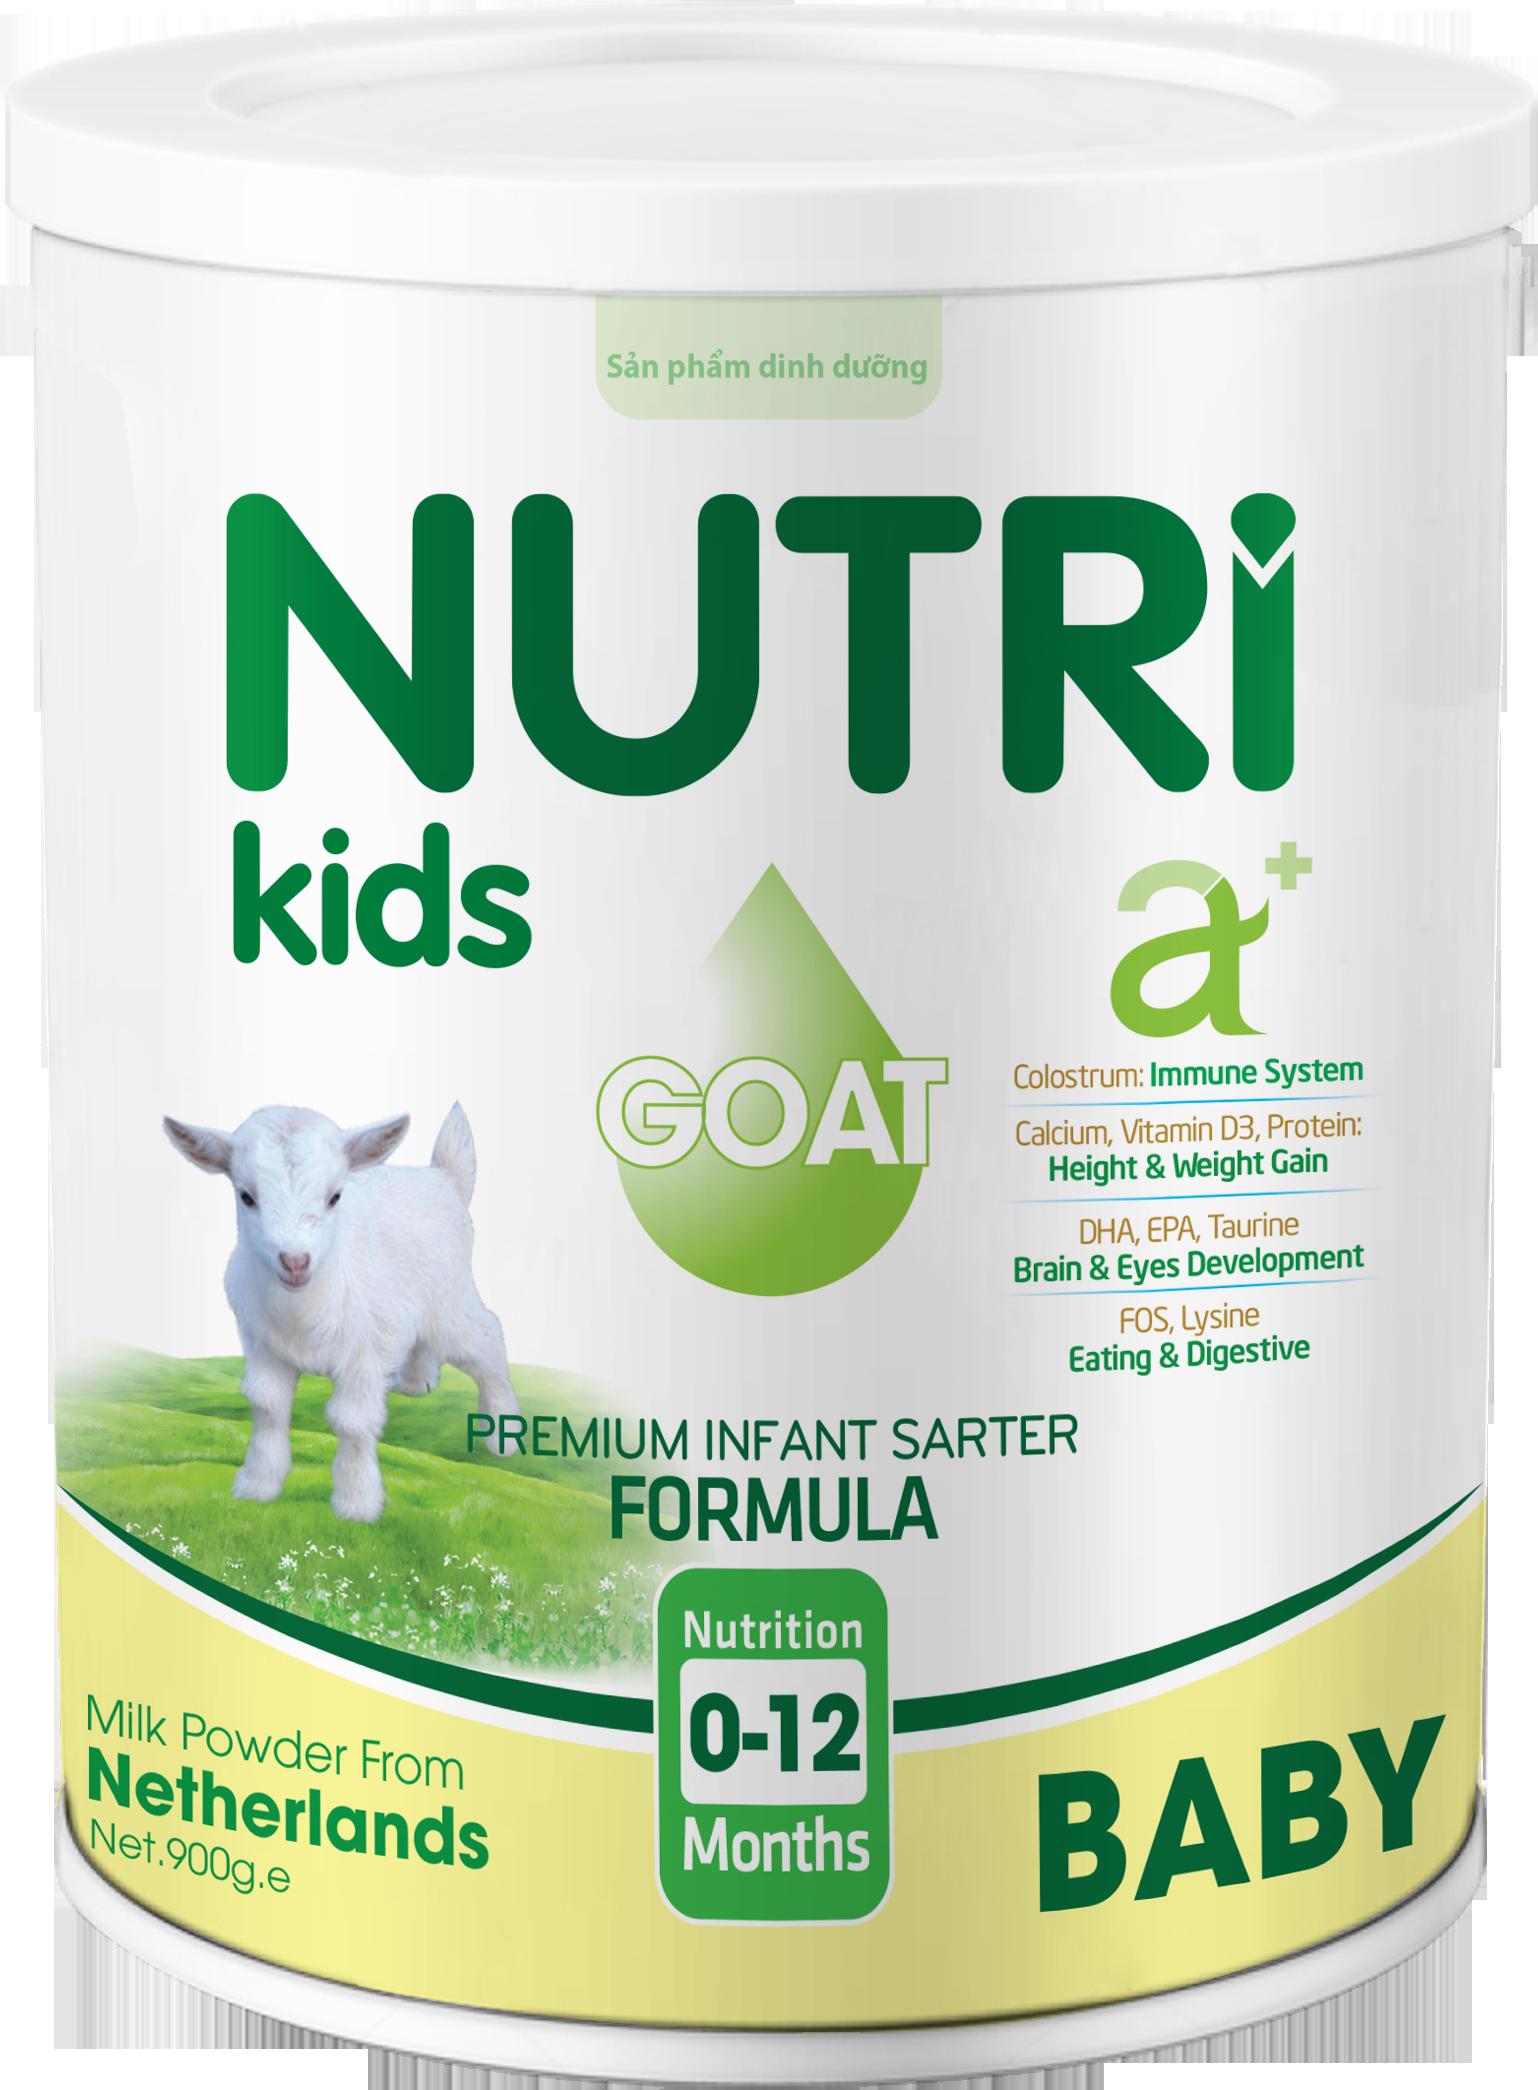 NUTRI KIDS A+ GOAT BABY 900g